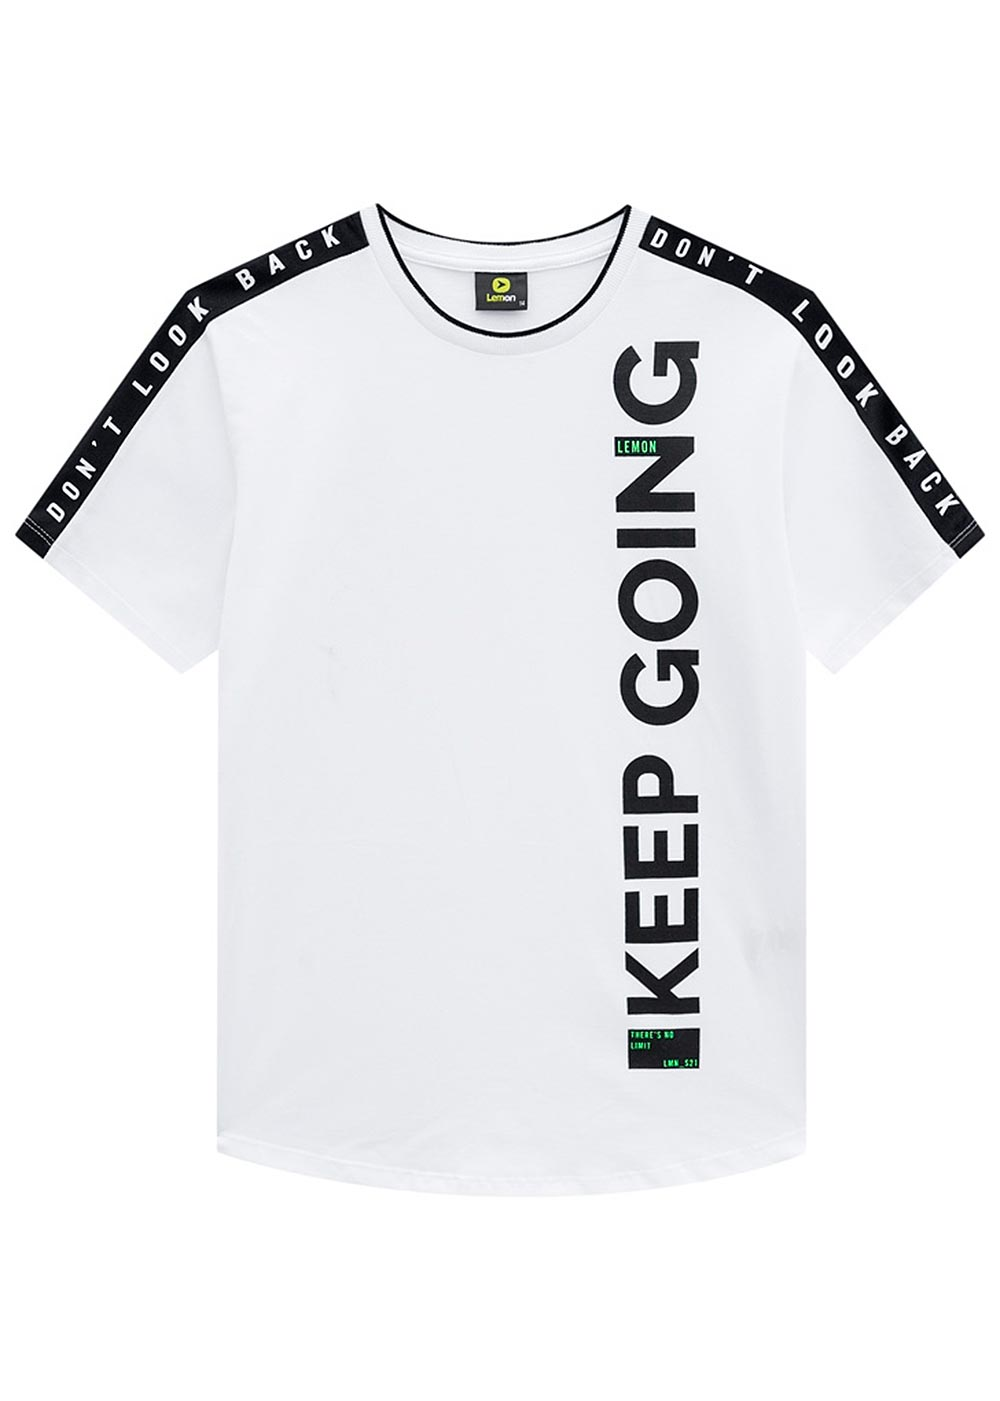 Camiseta Infantil Masculina Verão Branca Keep Lemon